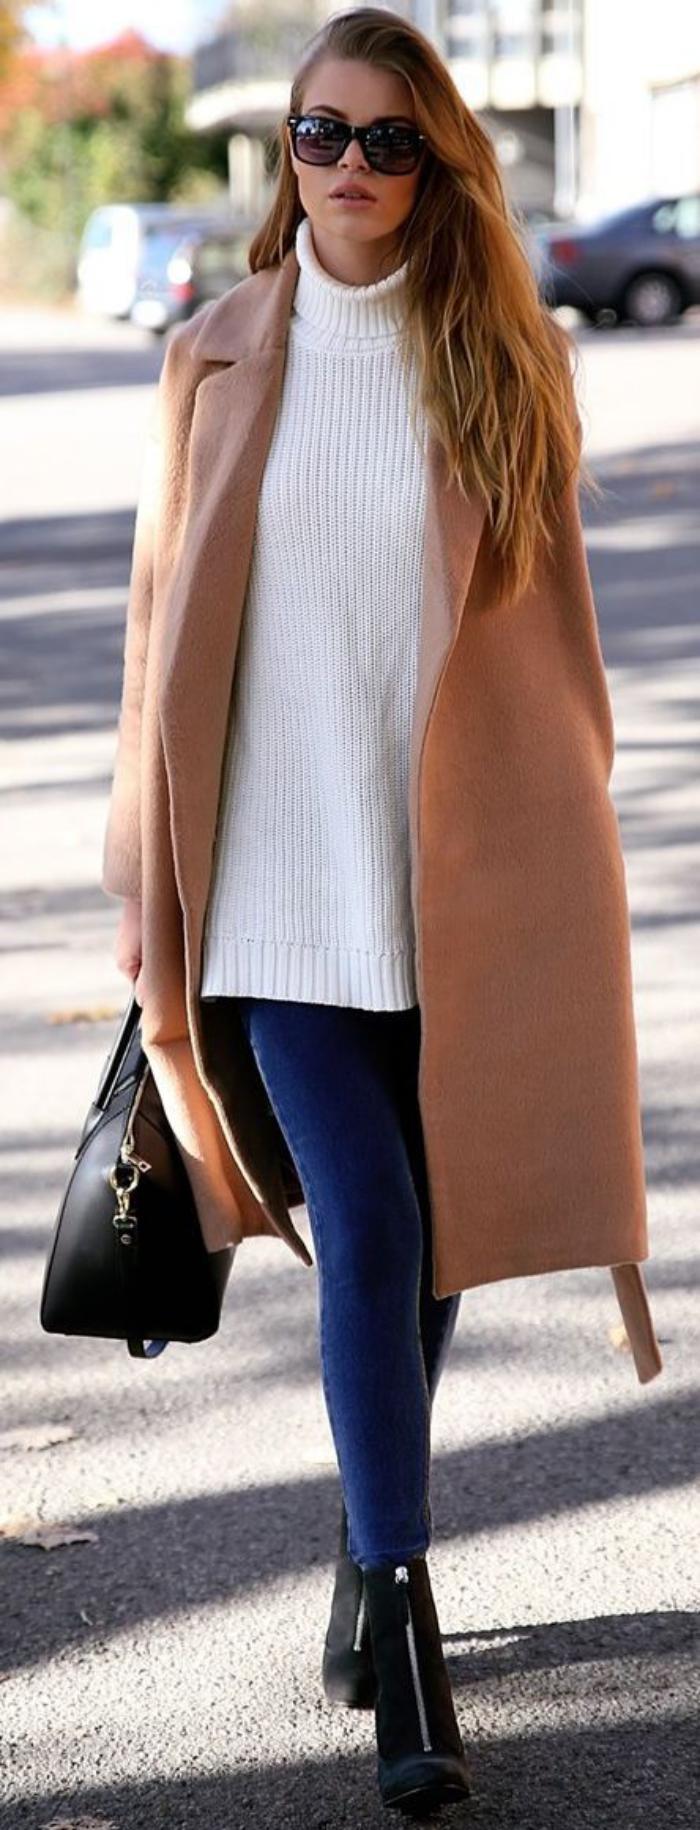 langer-wintermantel-Karamell-Farbe-weißer-Pullover-skinny-Jeans